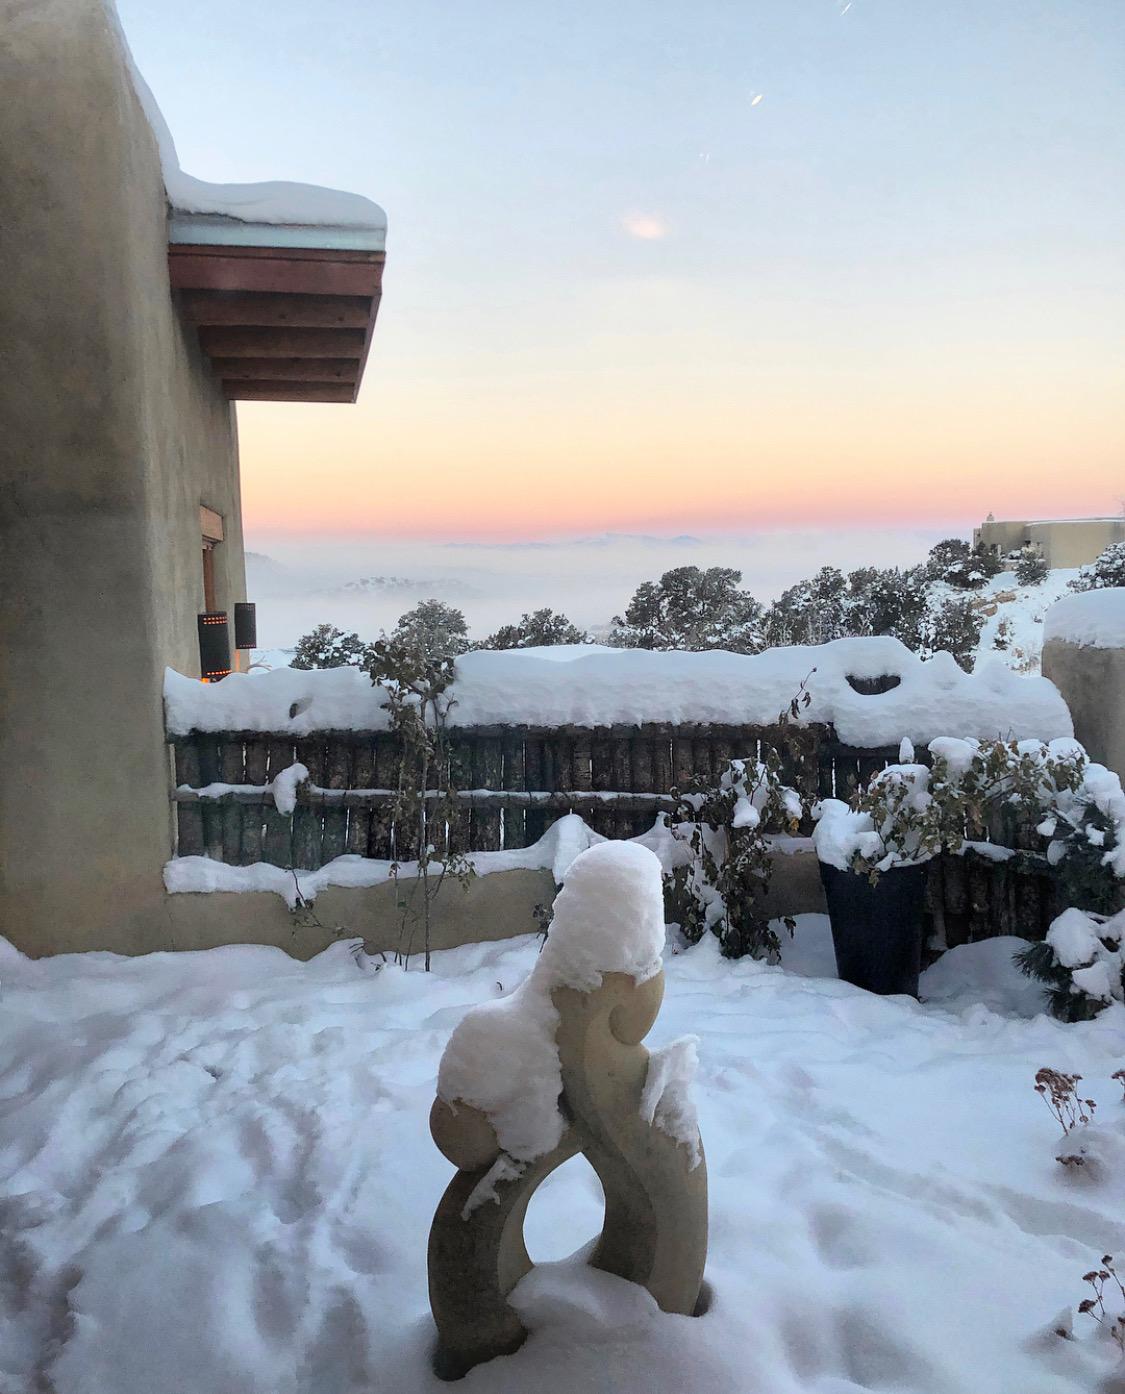 Winter - find the balance of this restorative season